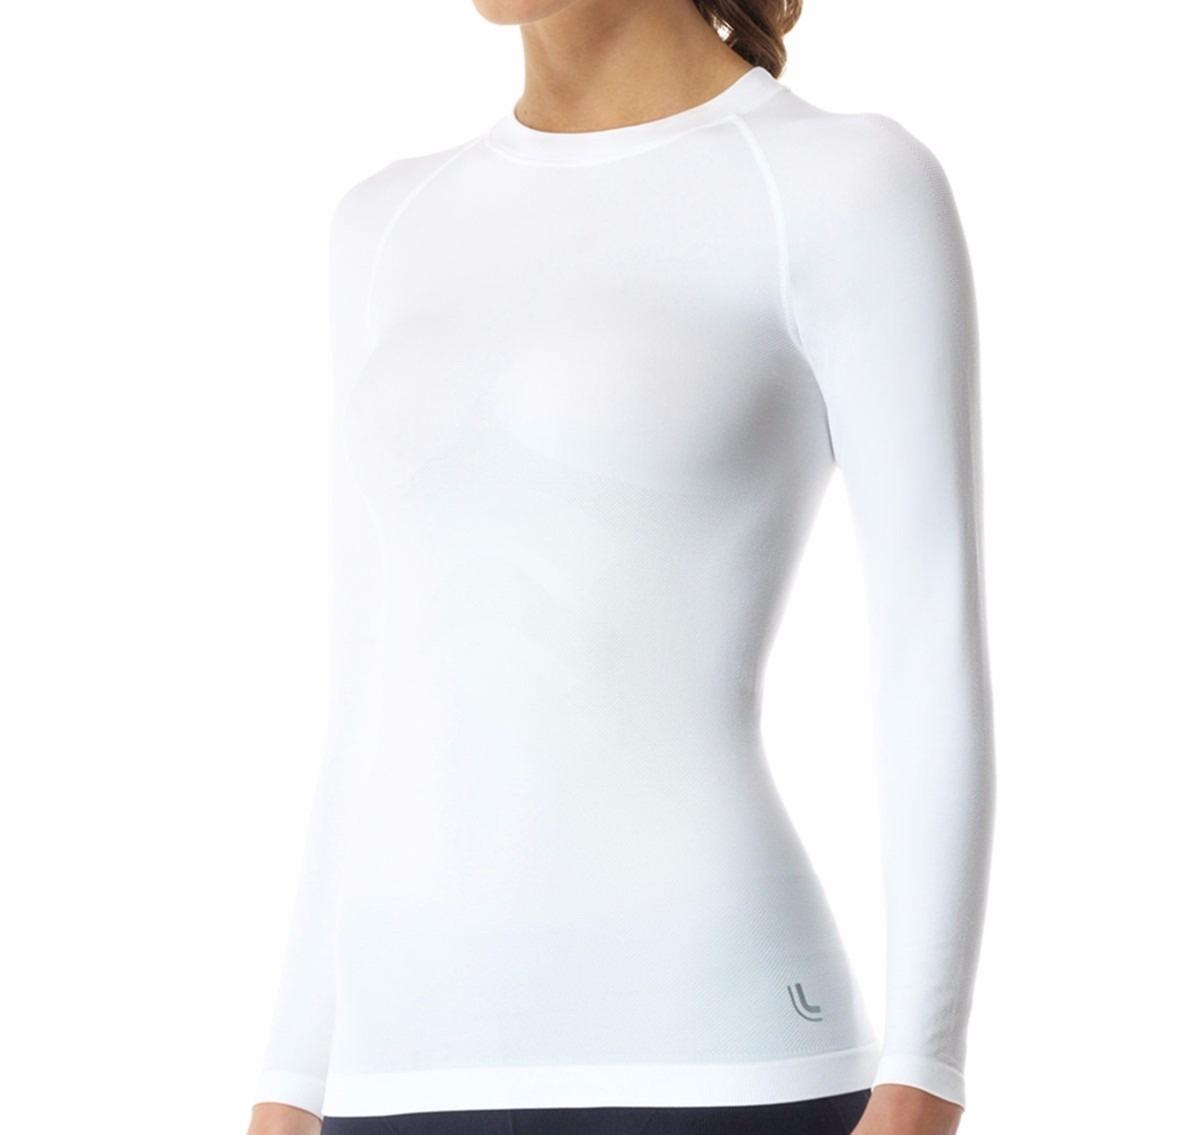 9828ce28c0 Camiseta Térmica Feminina Manga Longa Segunda Pele Lupo - R  77